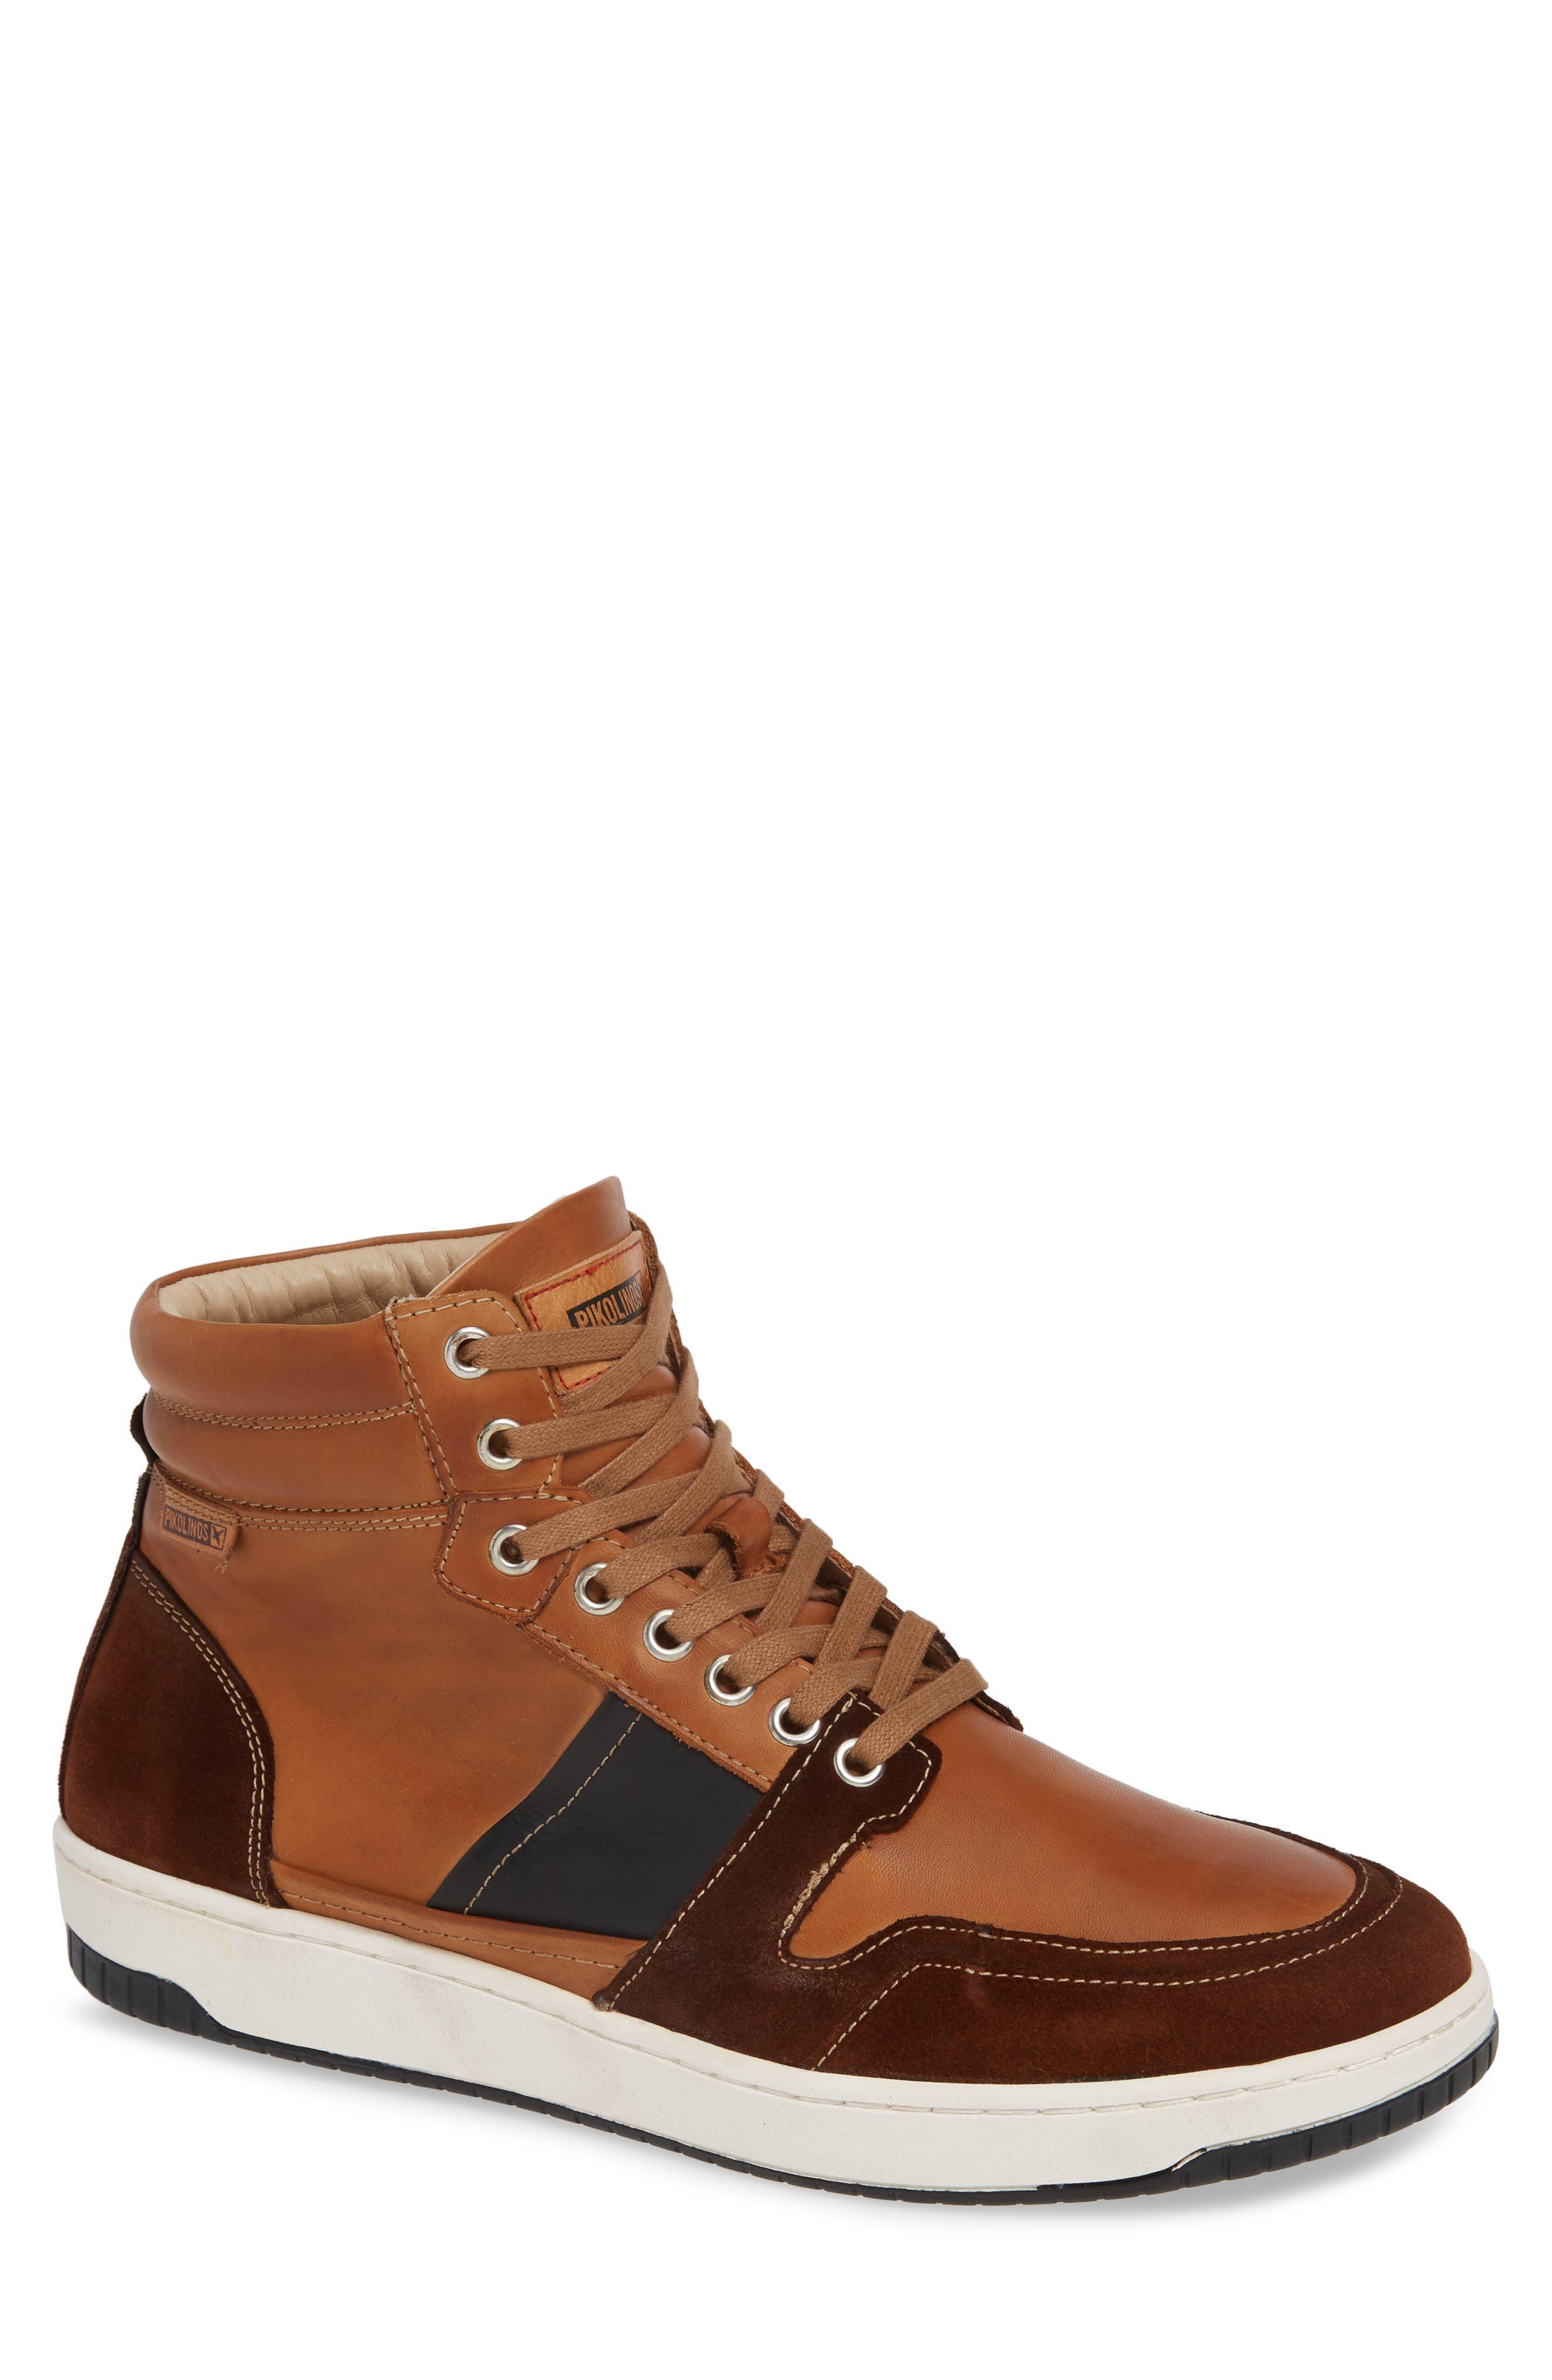 Corinto Sneaker,                         Main,                         color, BRANDY BLACK